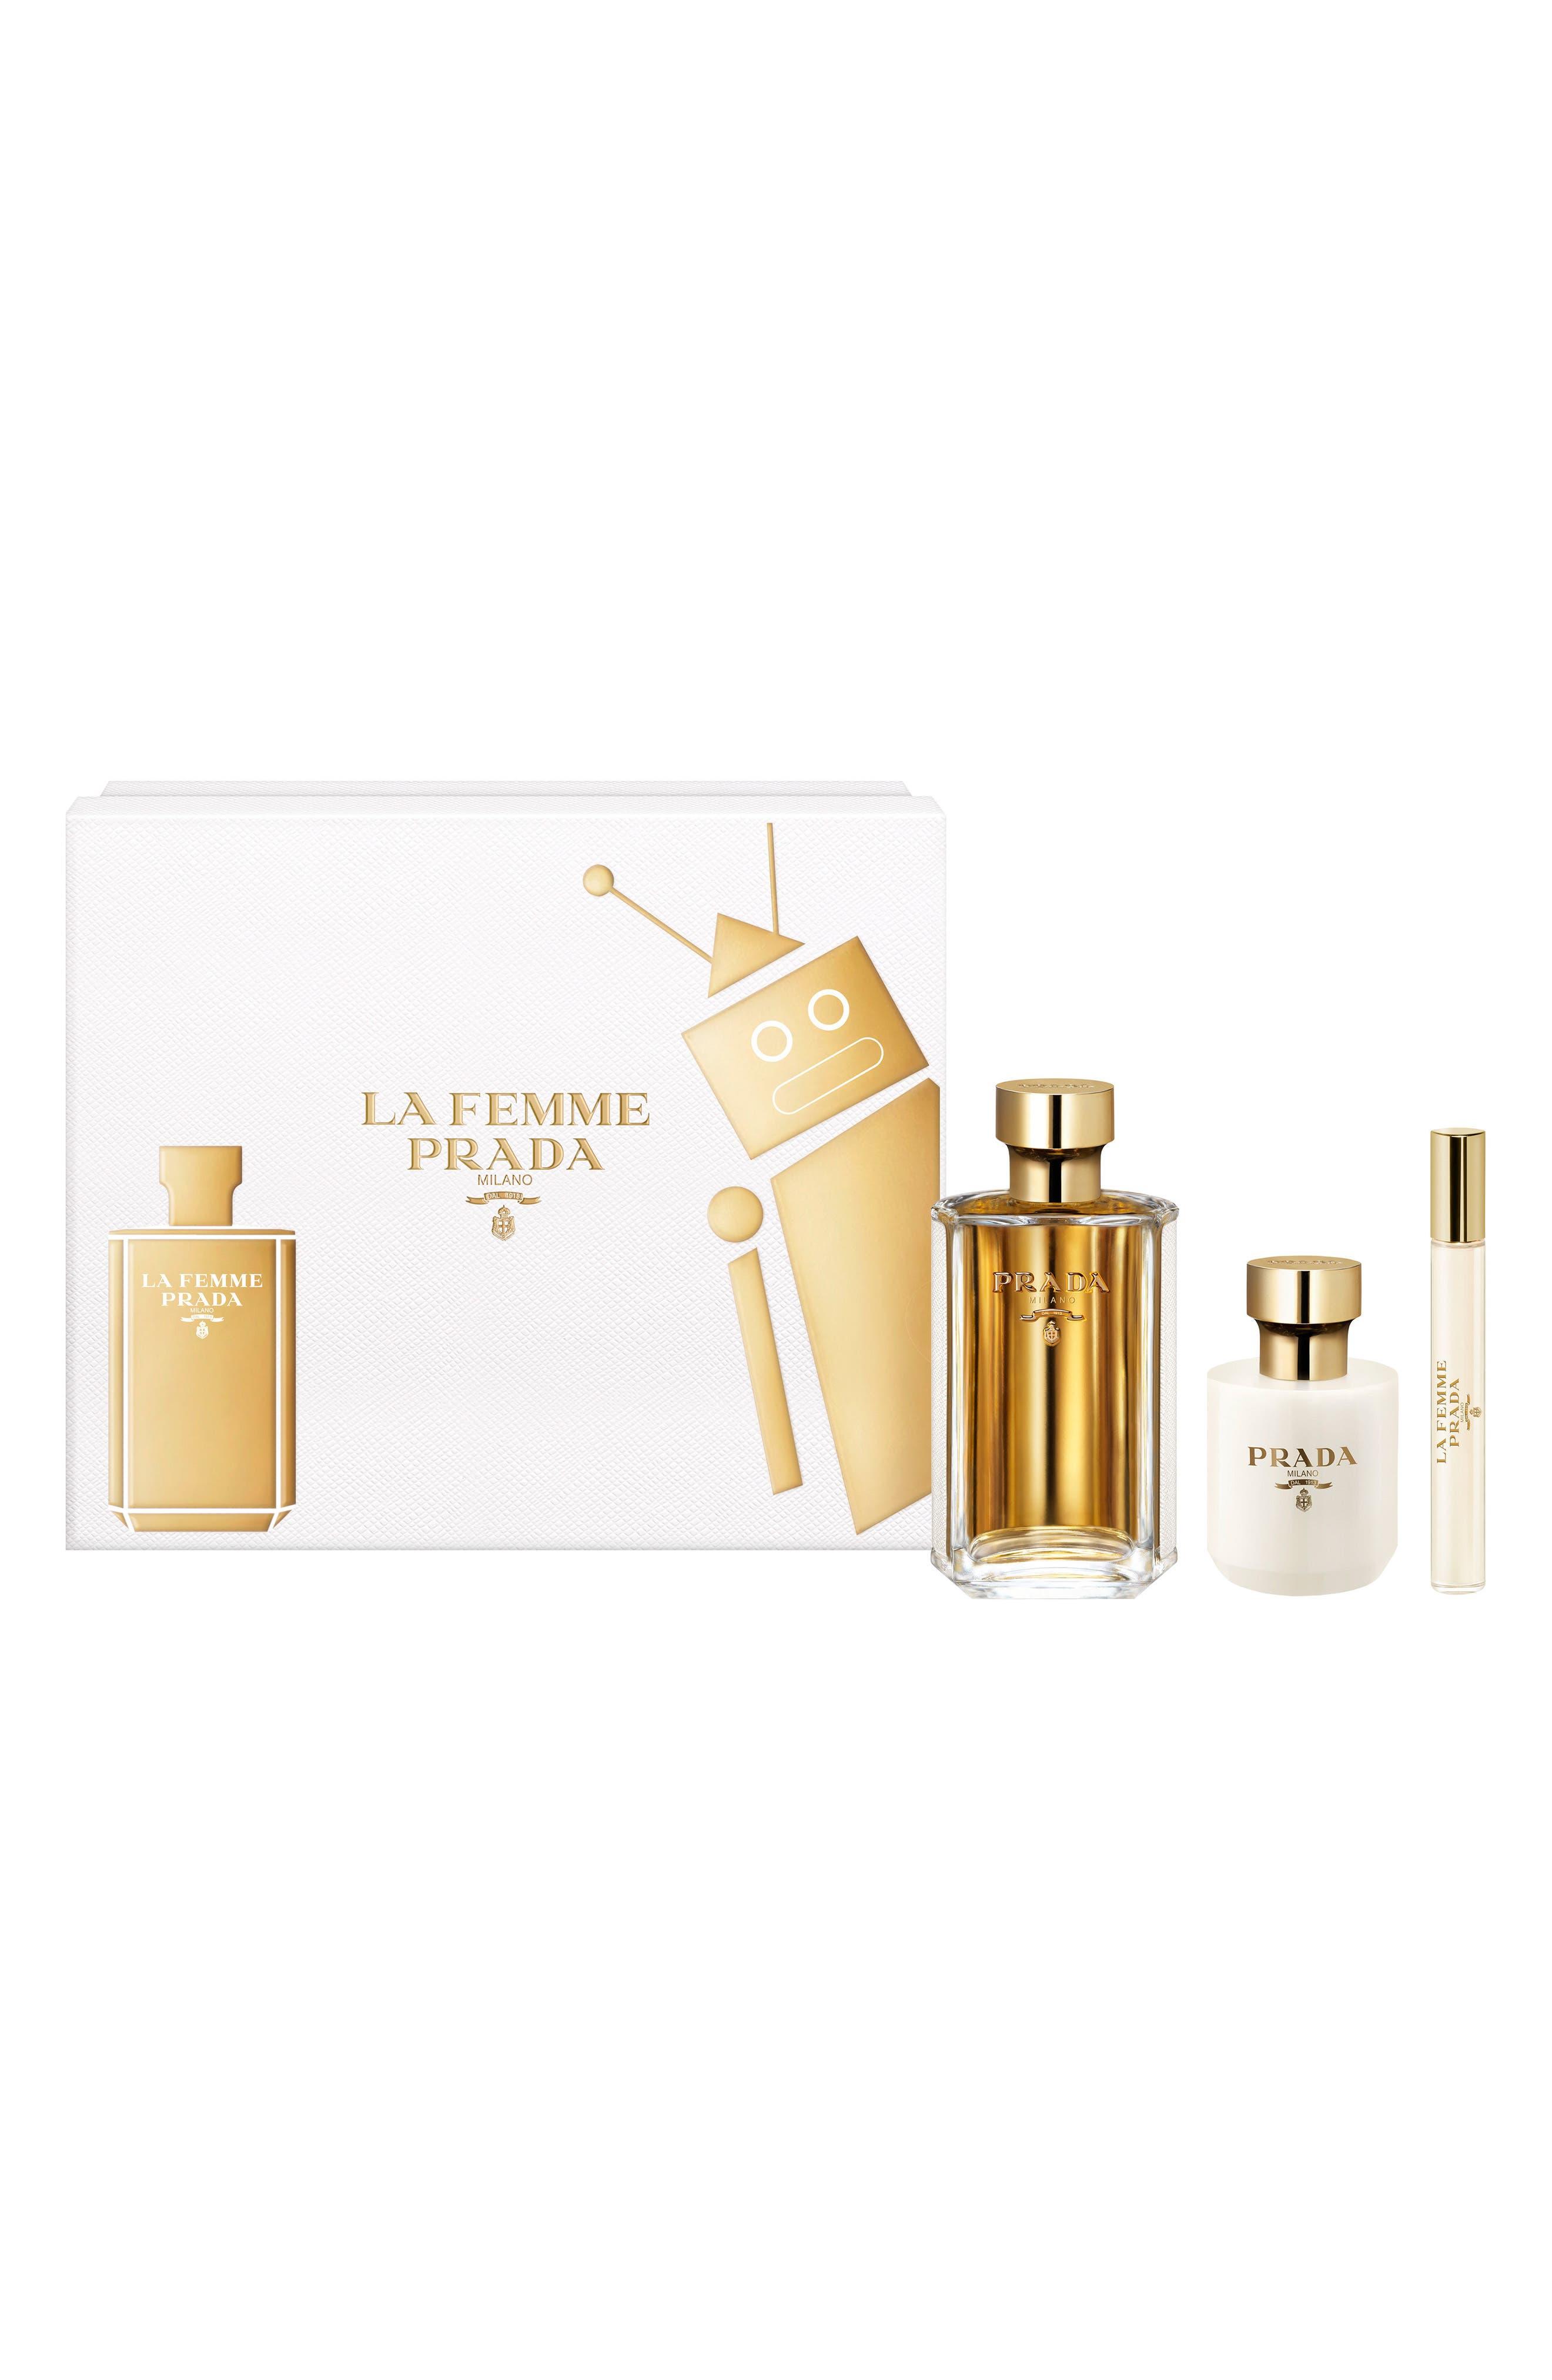 Alternate Image 1 Selected - Prada La Femme Prada Set ($182 Value)